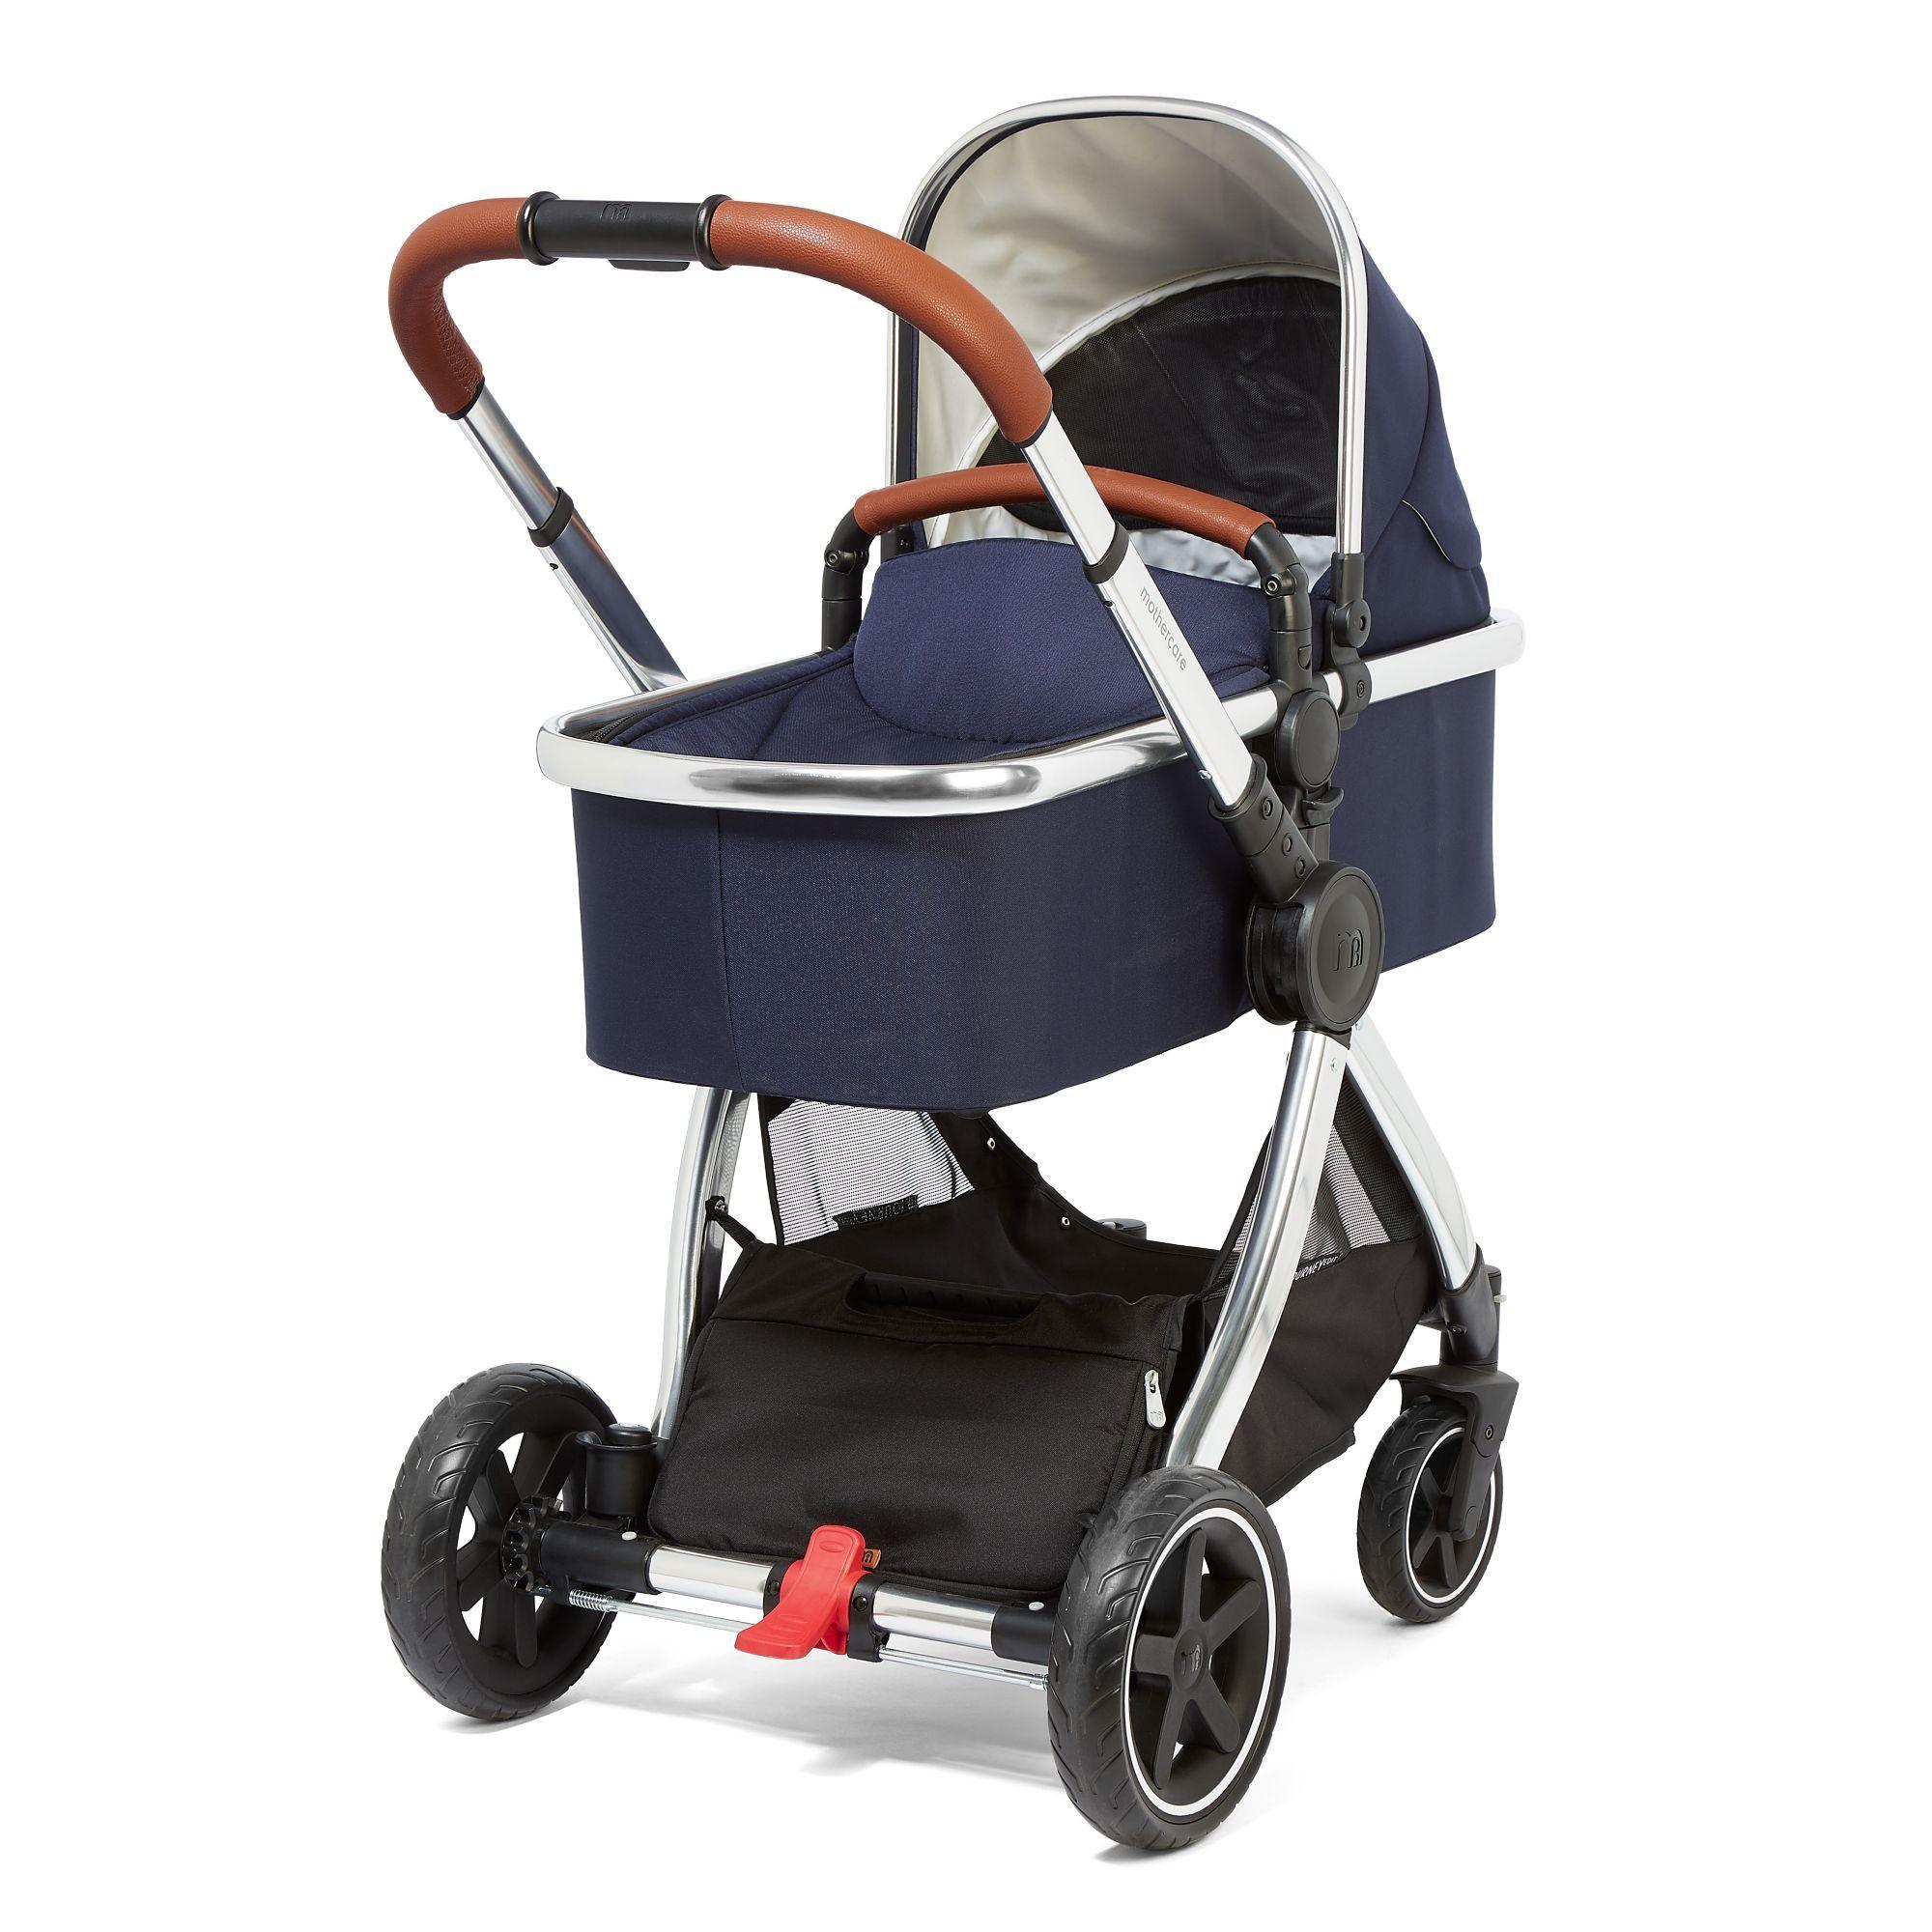 Shop Mothercare prams, Prams and pushchairs, Pram liners